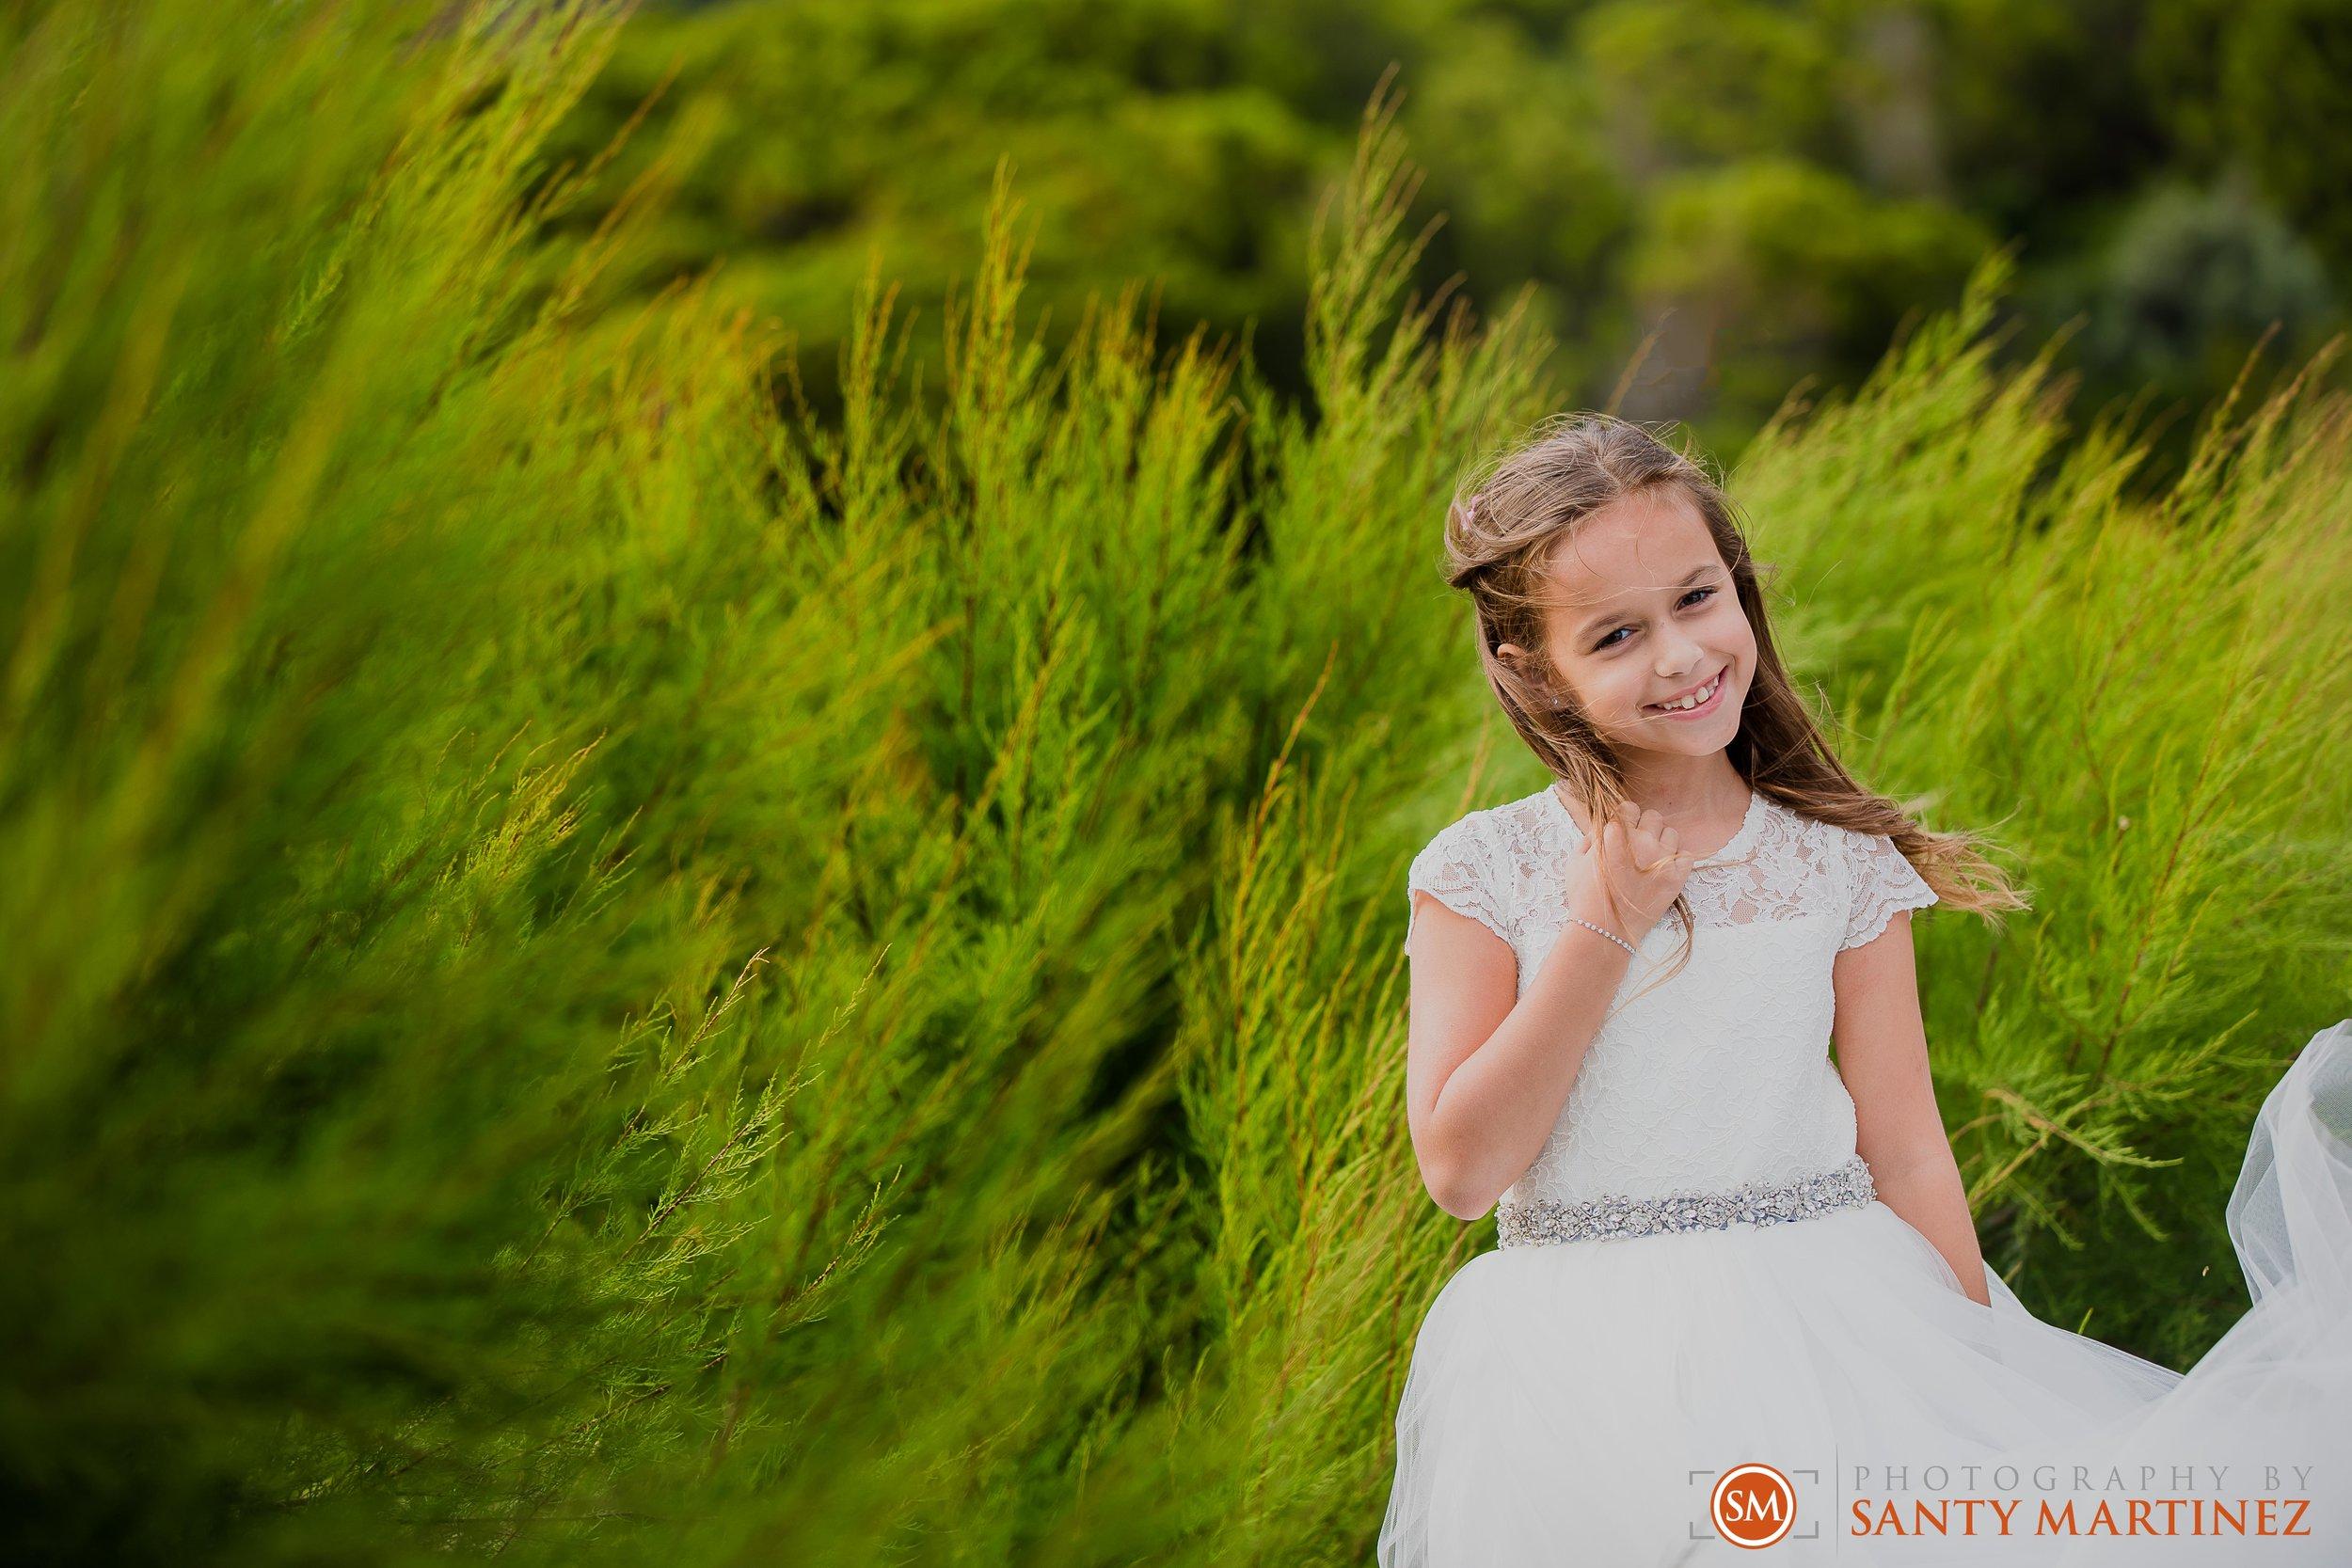 Wedding Capri Italy - Photography by Santy Martinez-36.jpg